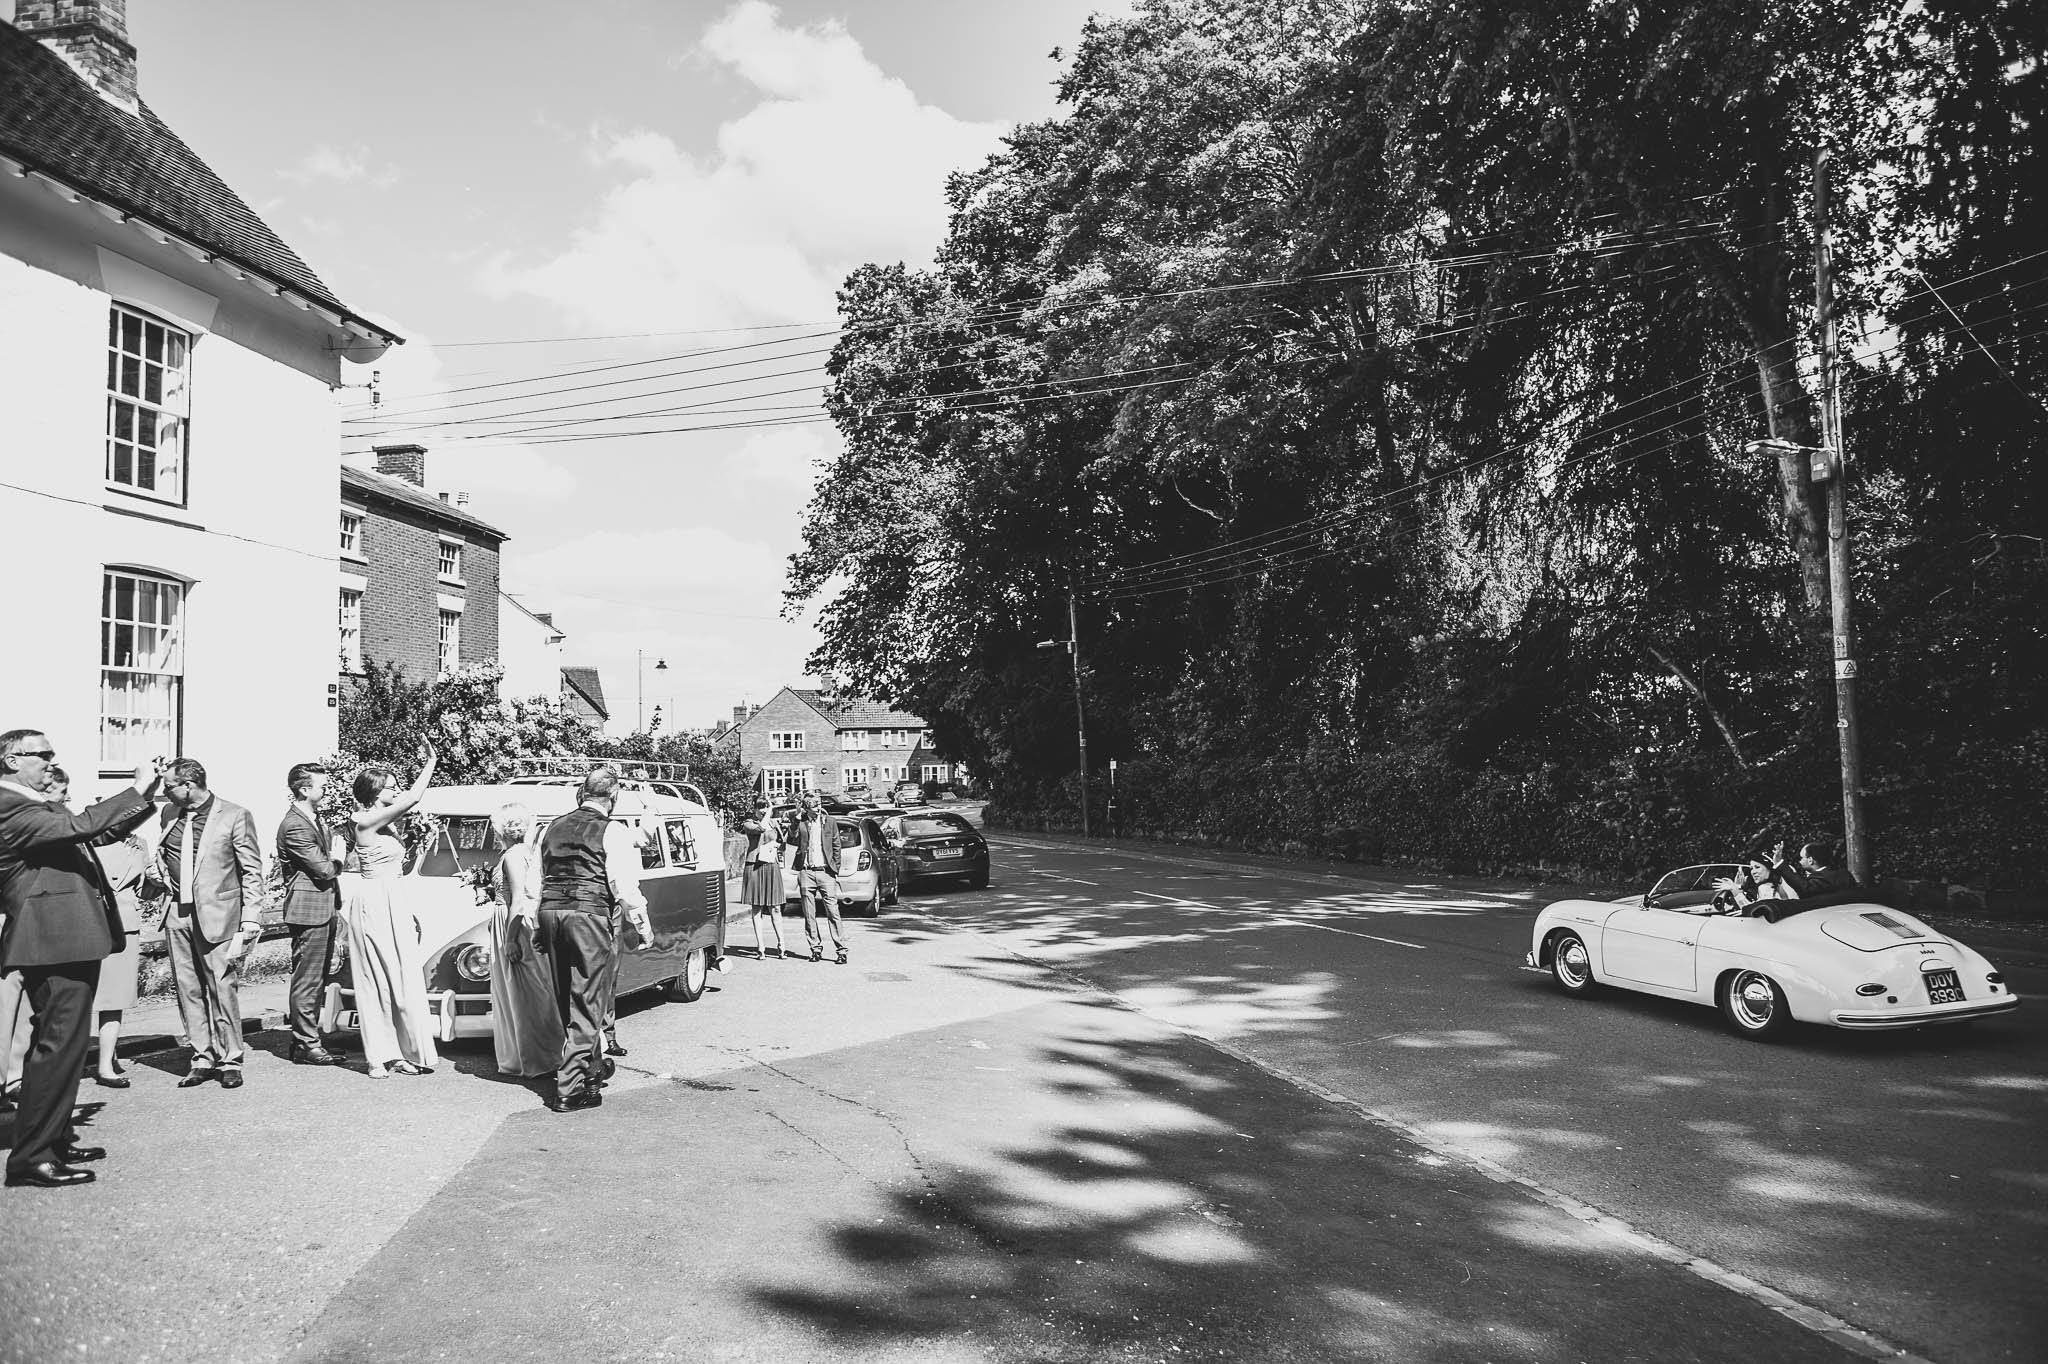 staffordshire-wedding-photographer-120.jpg